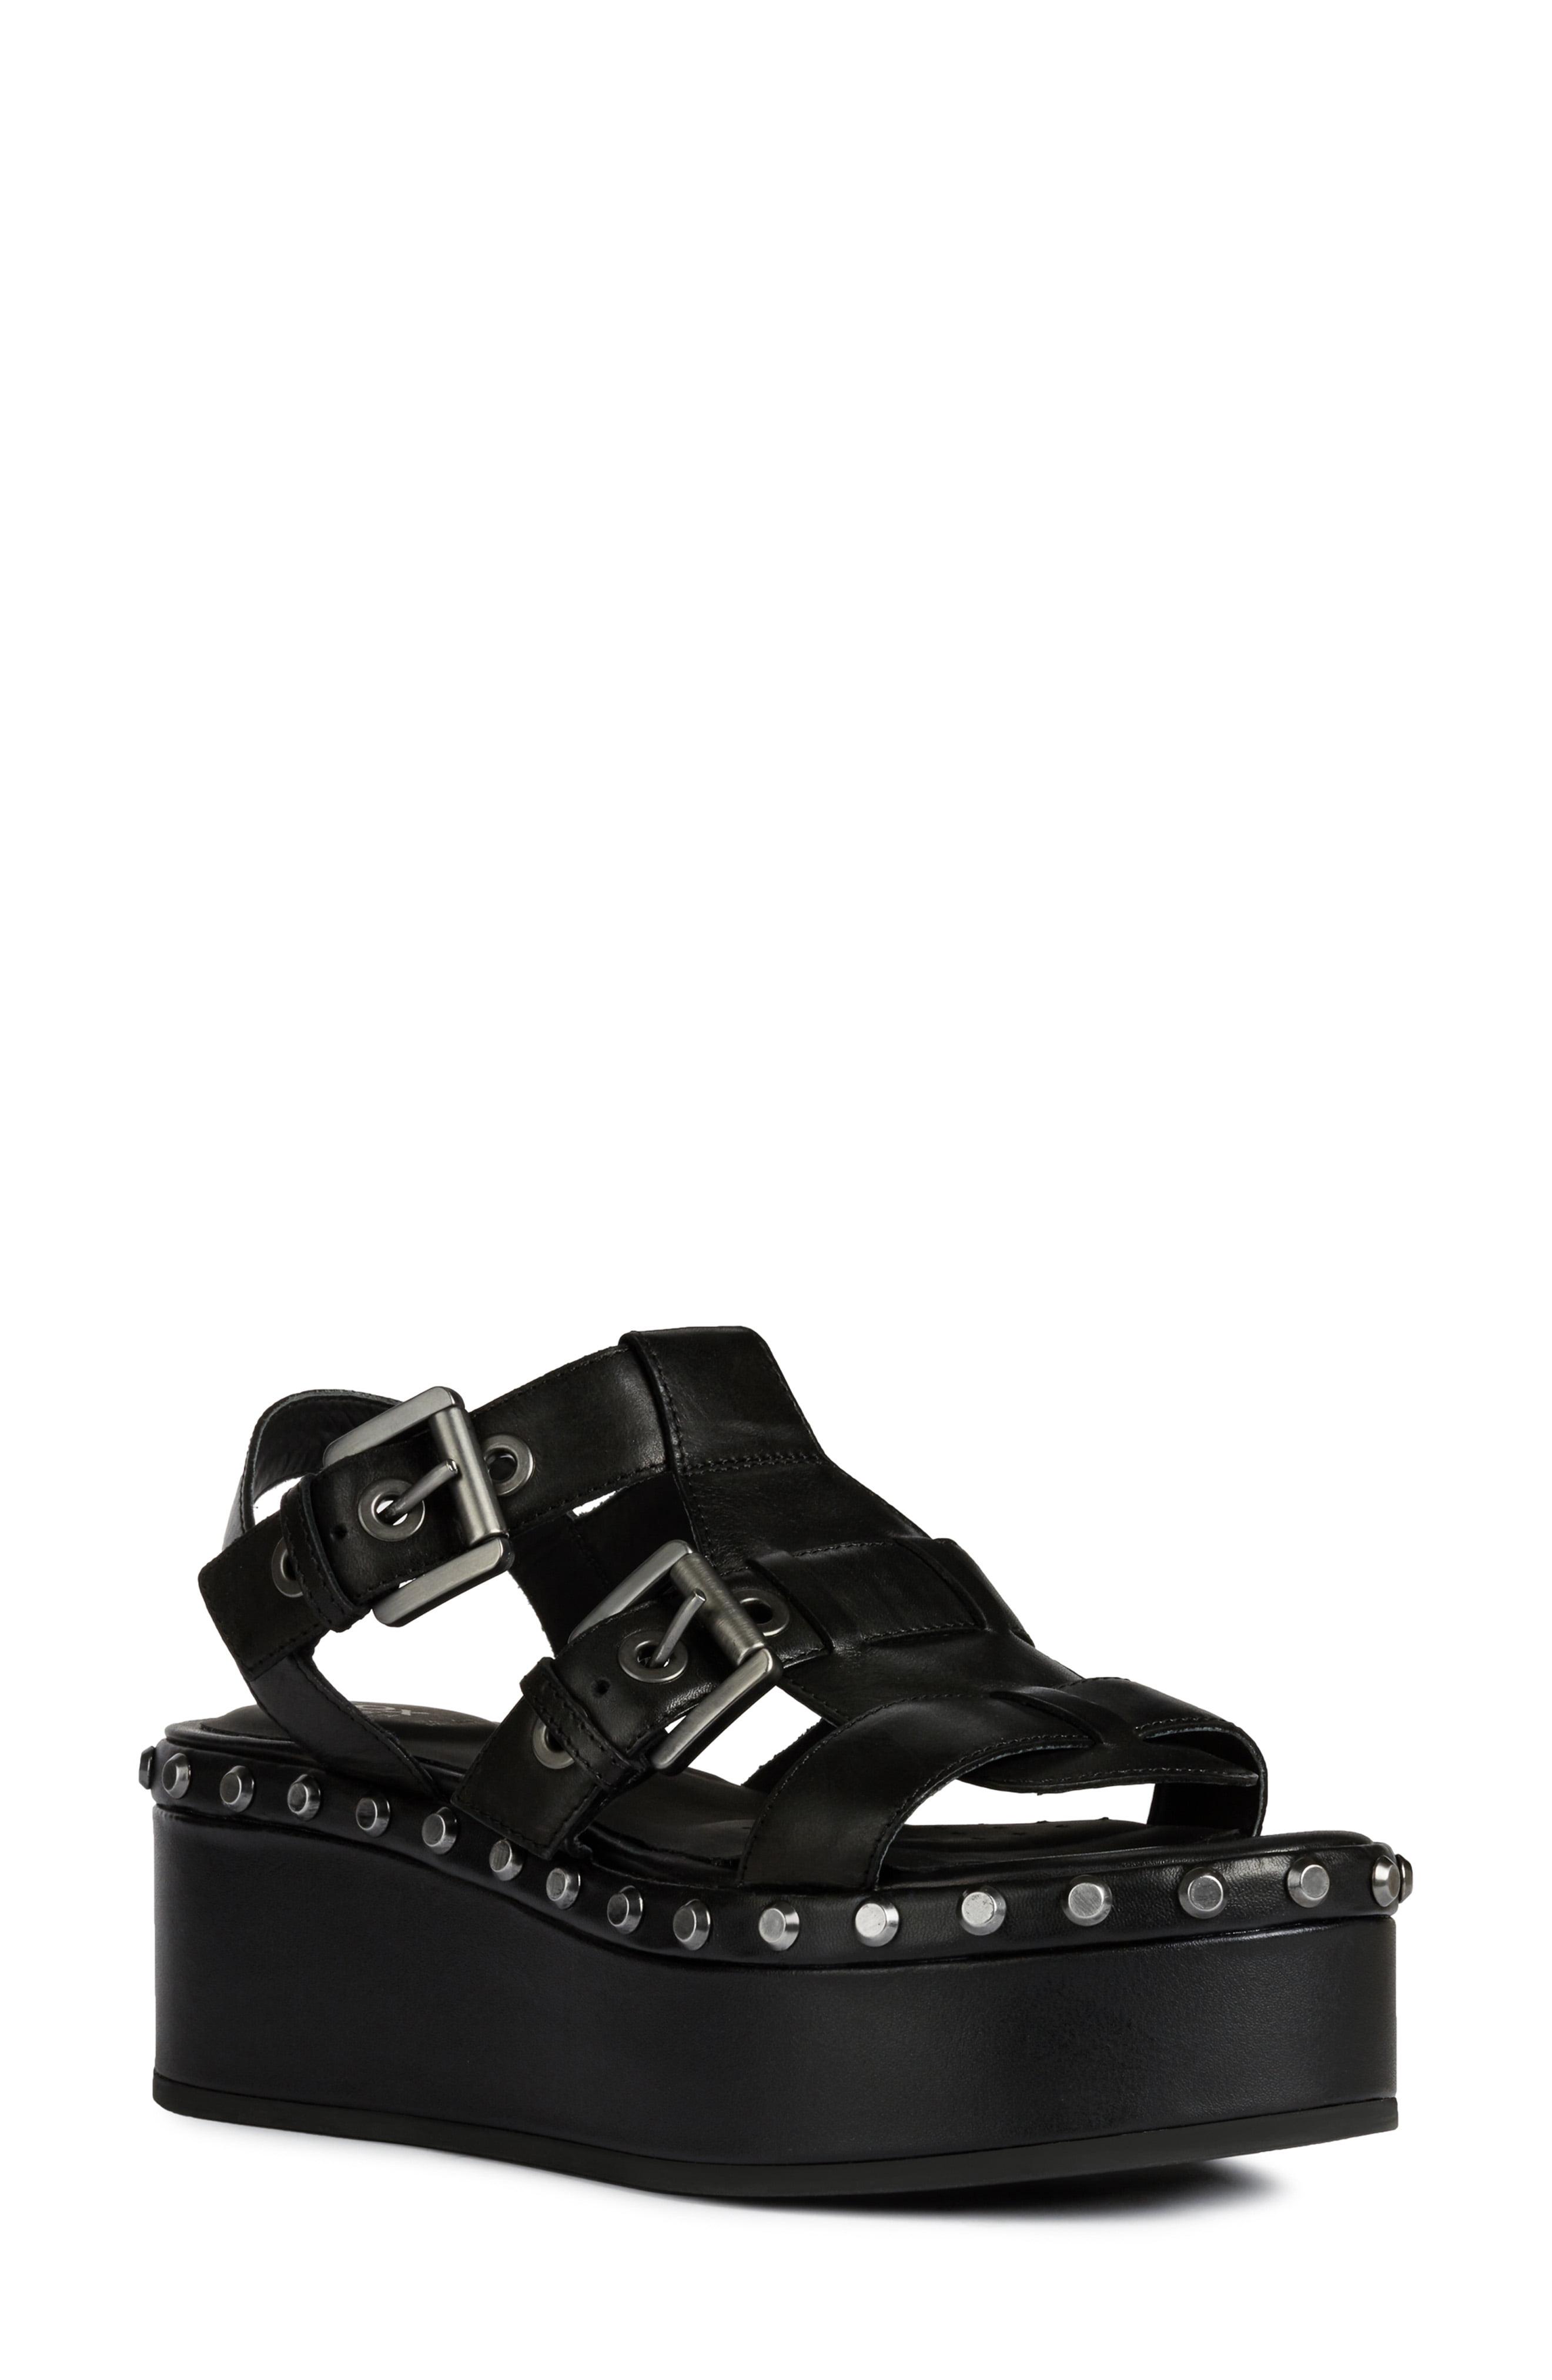 Women's Geox Shakima Platform Sandal, Size 6US 36EU